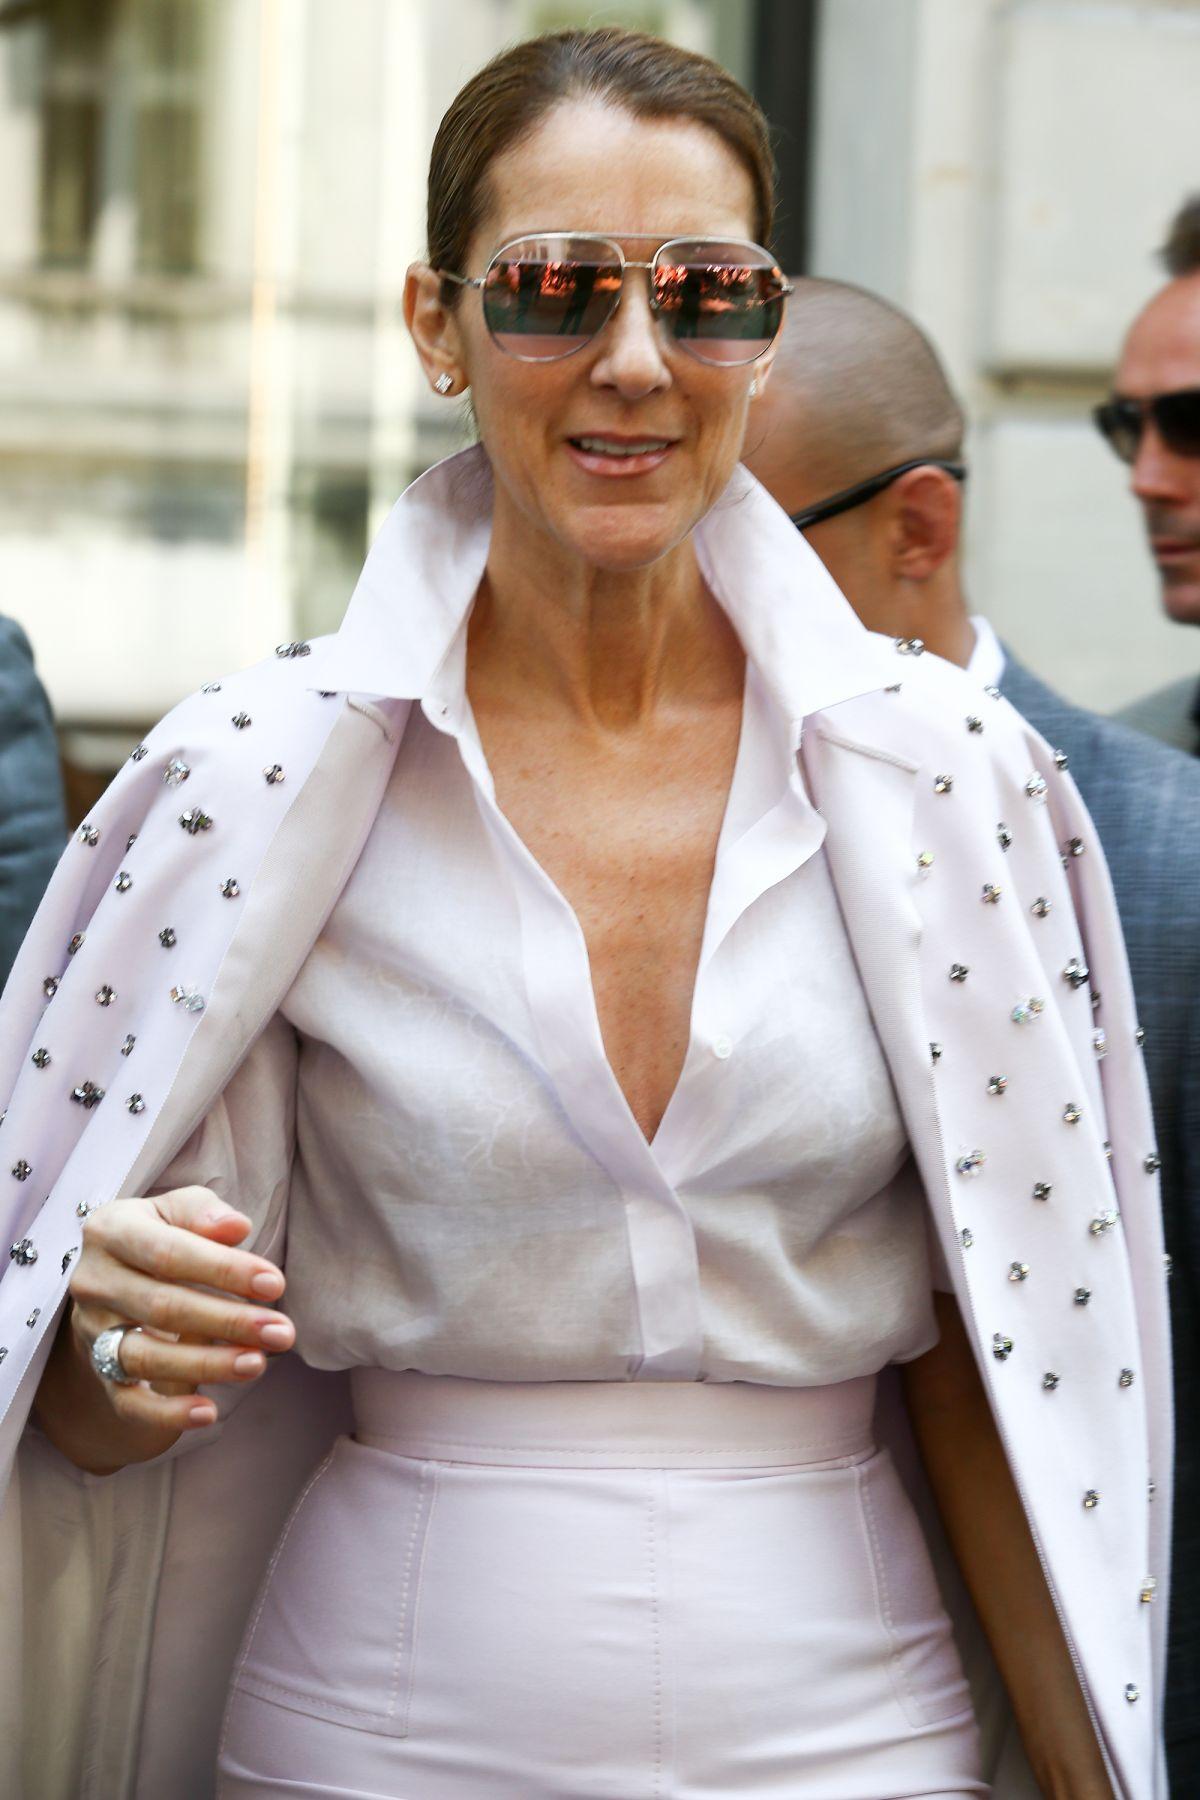 celine dion leaves her hotel in paris 06/20/2017 - hawtcelebs